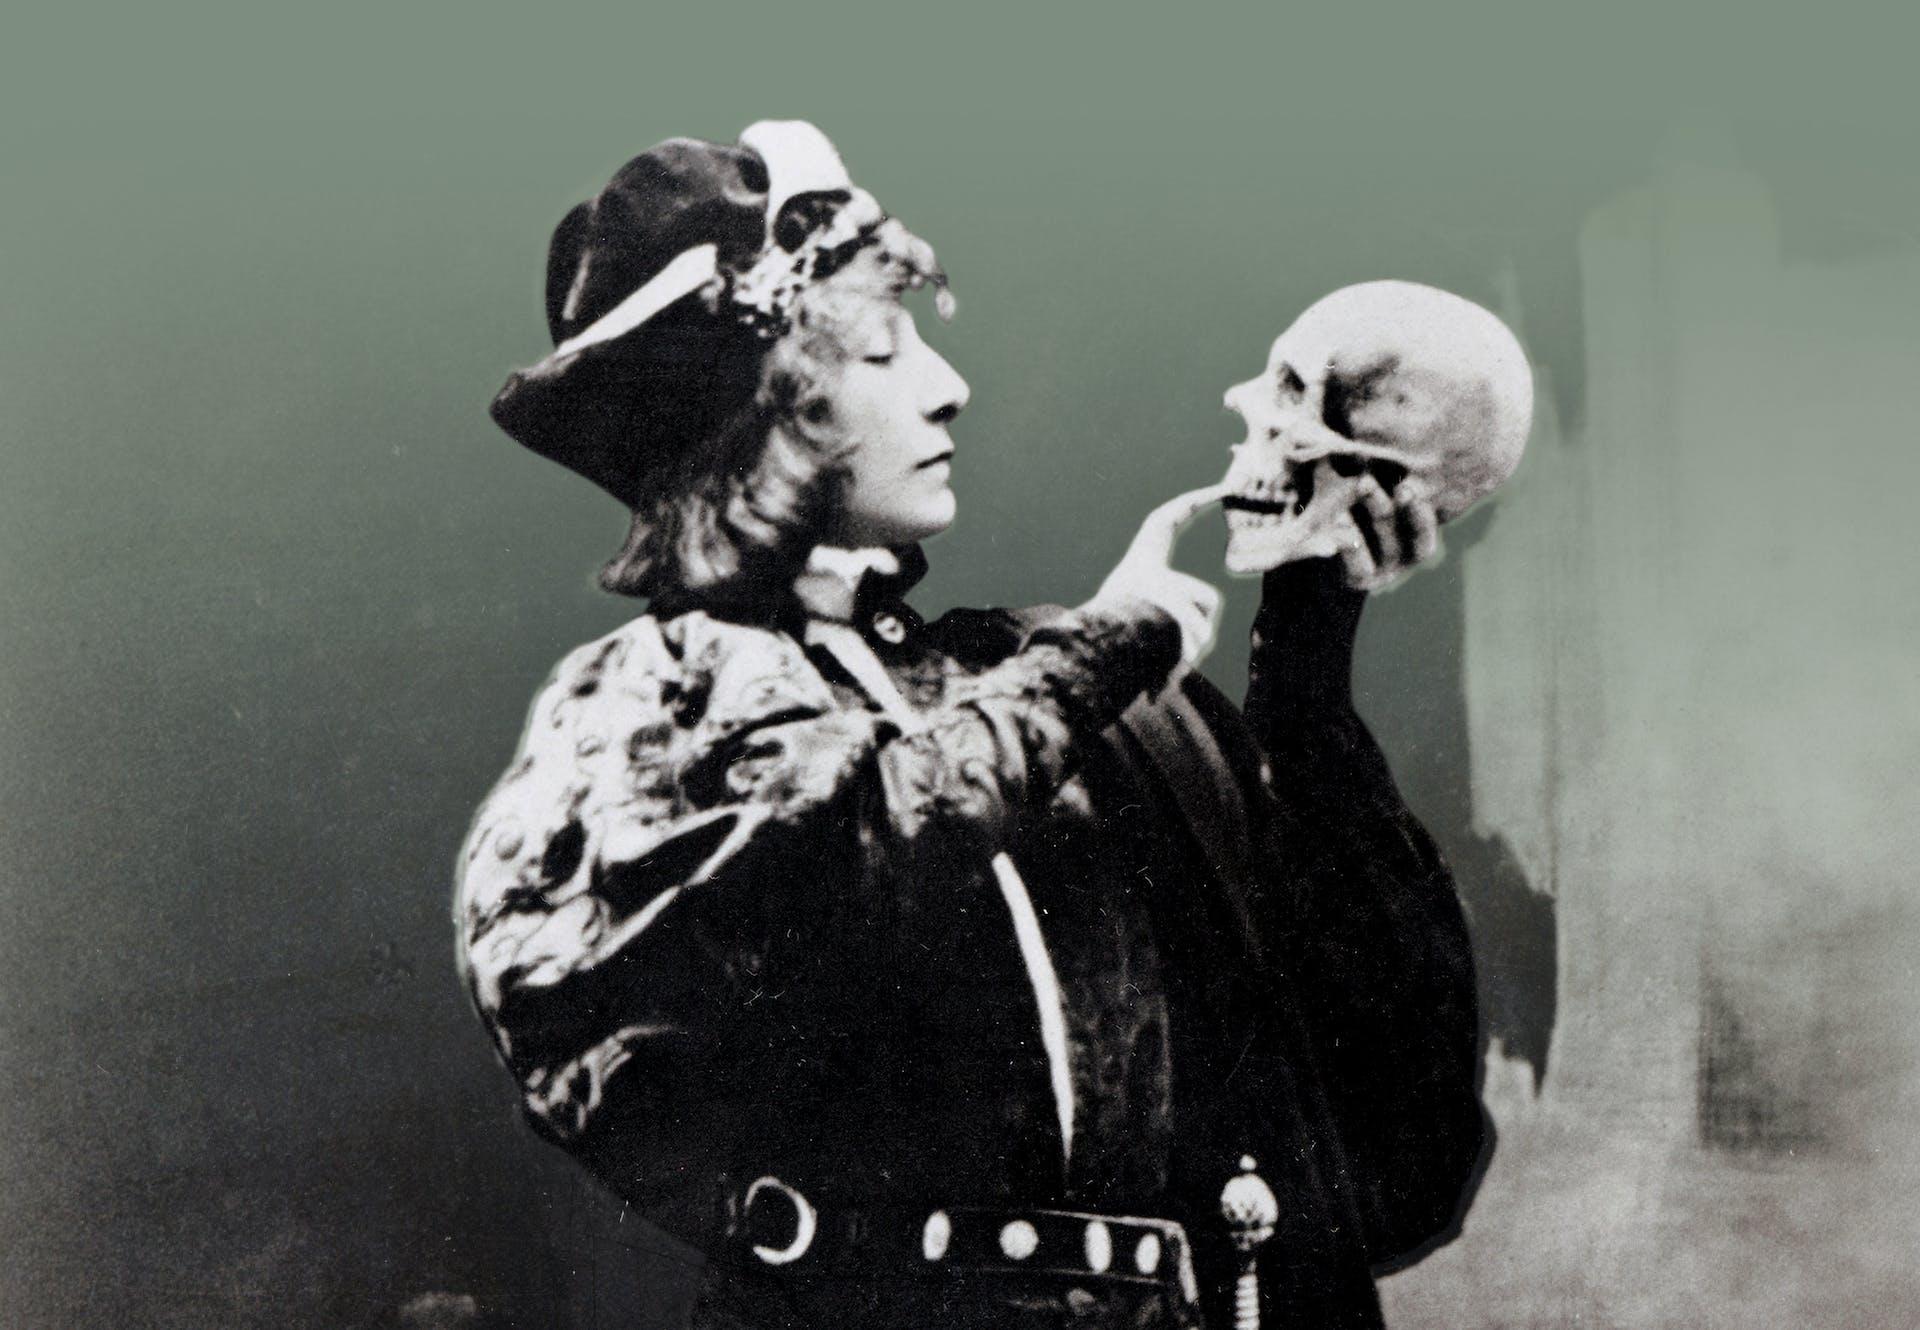 Pestepidemie Bracht Shakespeare Succes Historianetnl